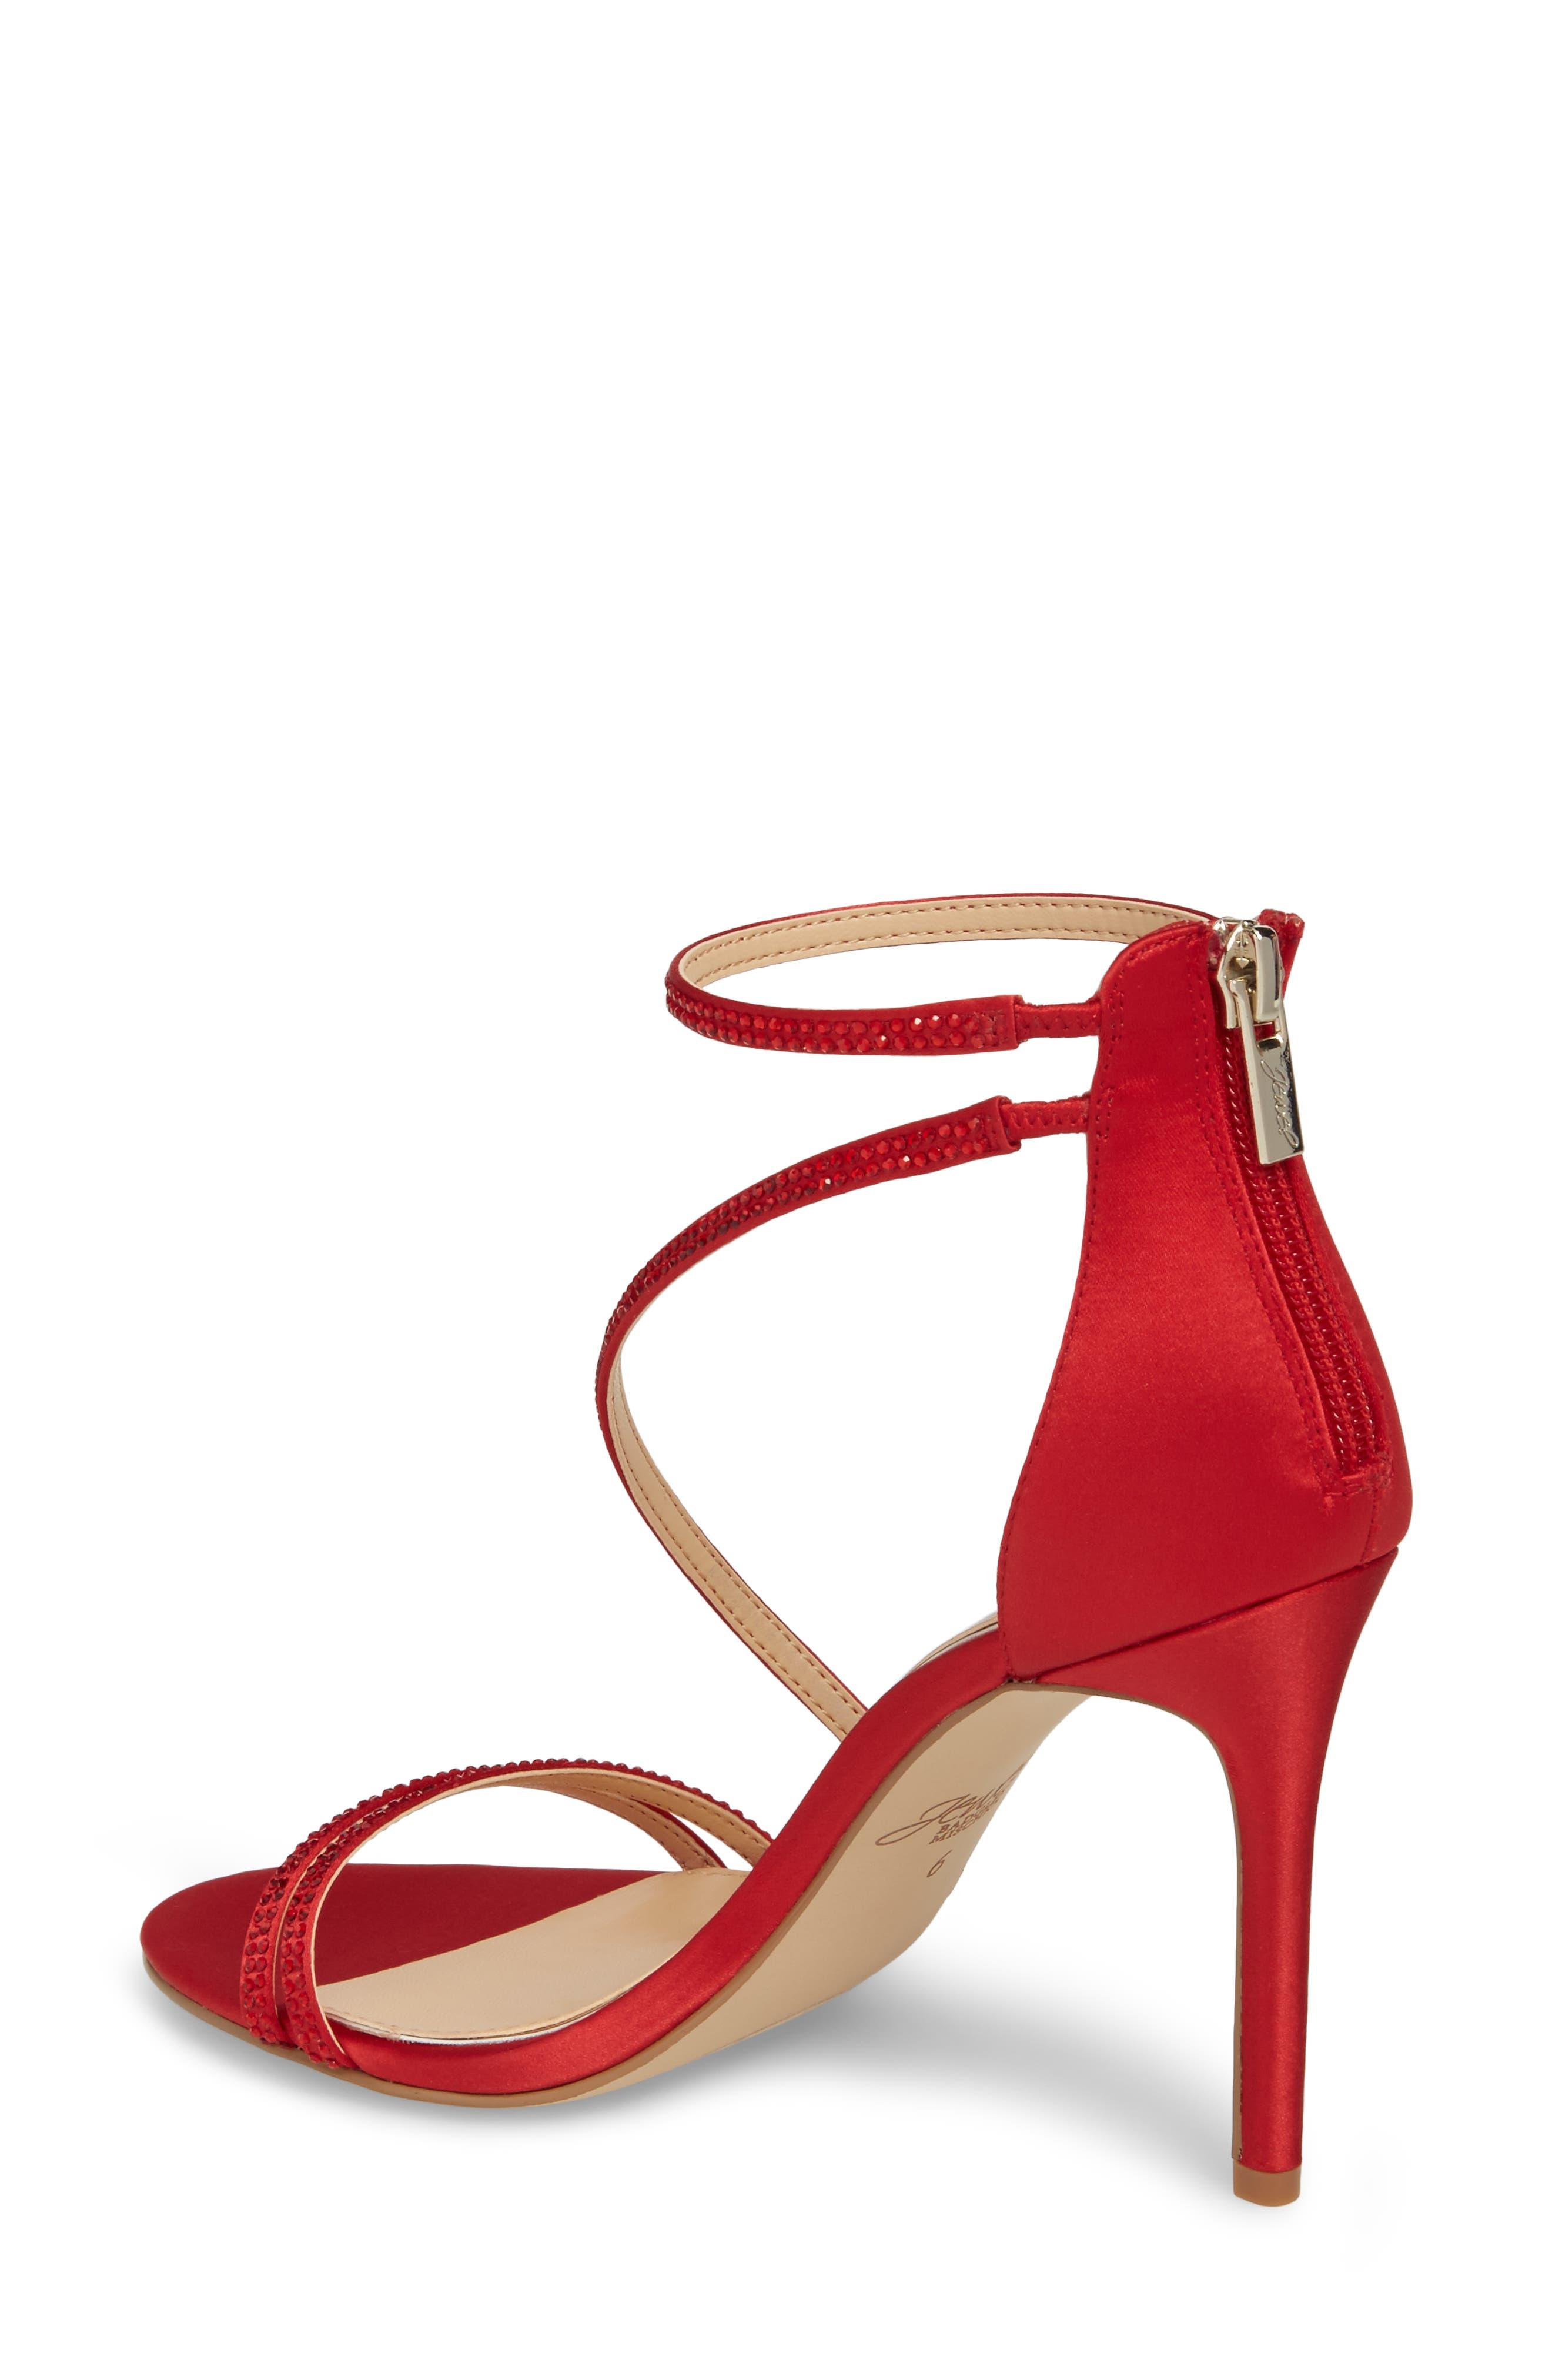 Gail Crystal Embellished Sandal,                             Alternate thumbnail 2, color,                             Red Satin